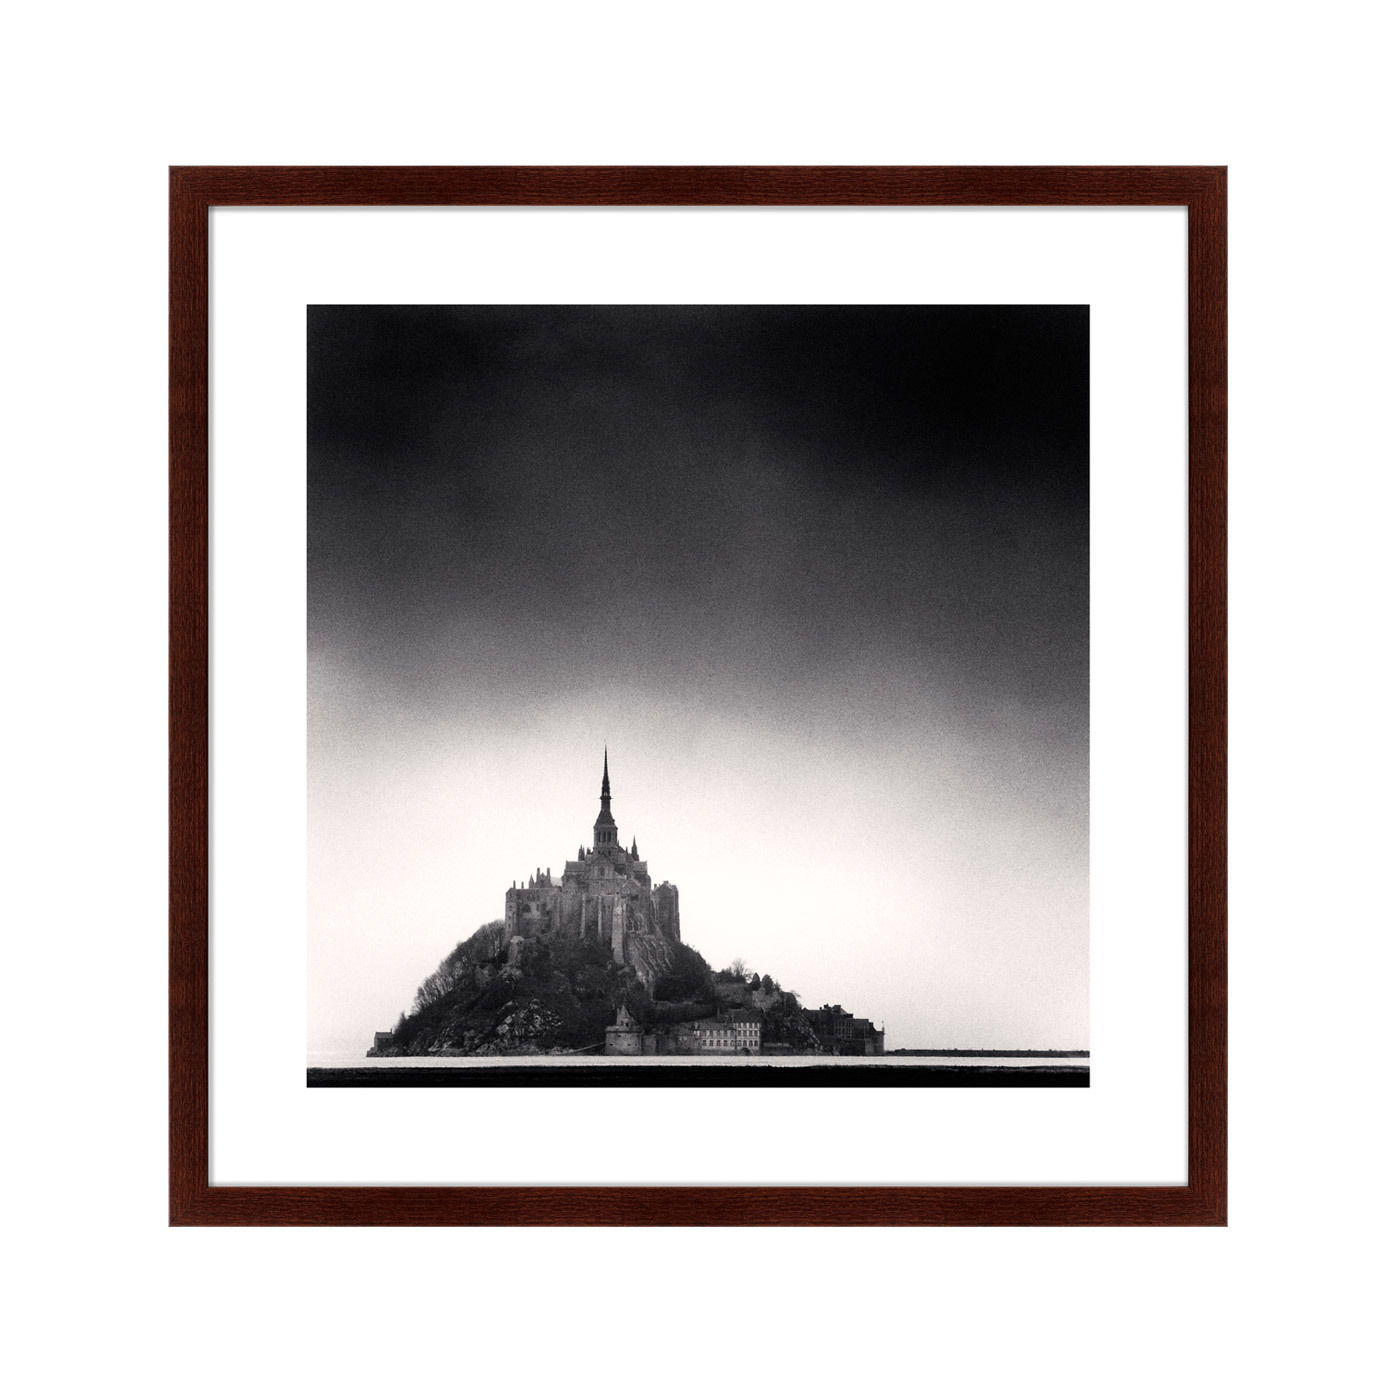 {} Картины в Квартиру Картина Castle (79х79 см) мне предлагают 1комнат квартиру